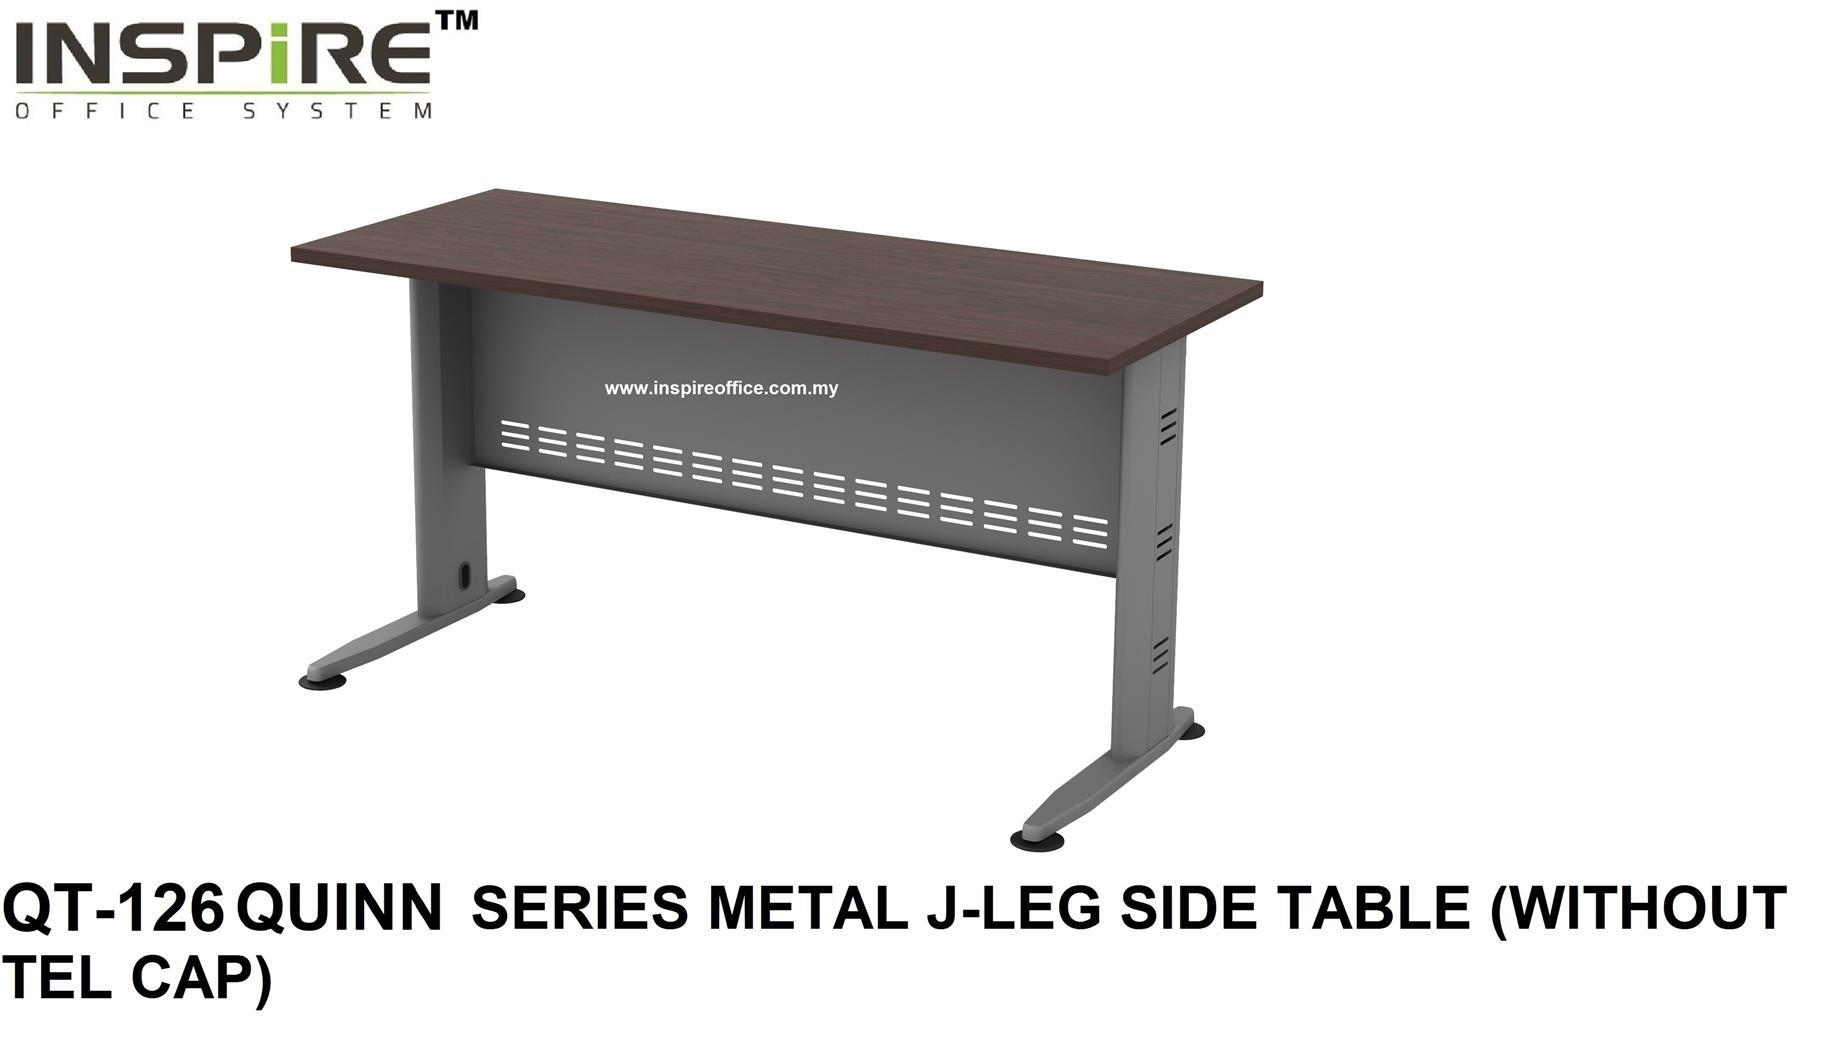 Sidetable Wit Hout.Qt 126 Quinn Series Metal J Leg Side Table Without Tel Cap